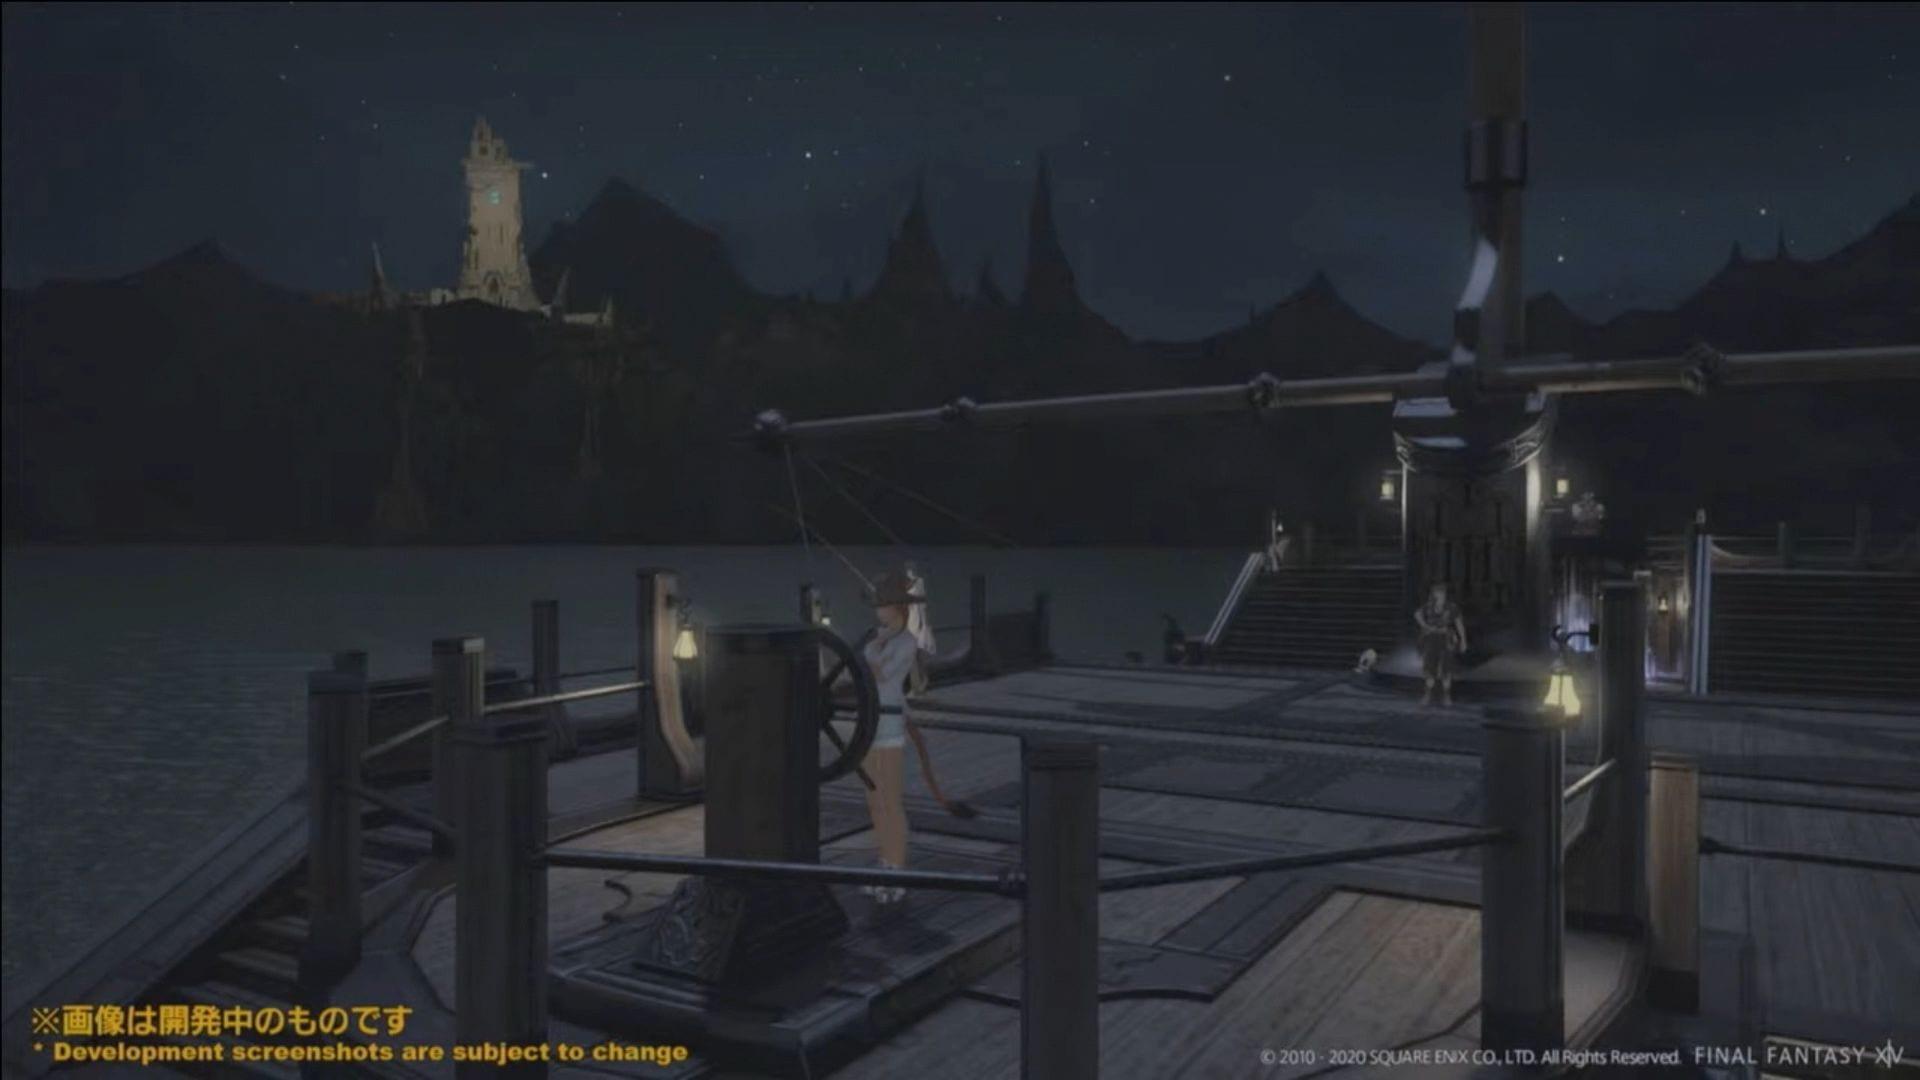 Final-Fantasy-XIV-Screenshot-2020-11-27-13-25-46.jpg